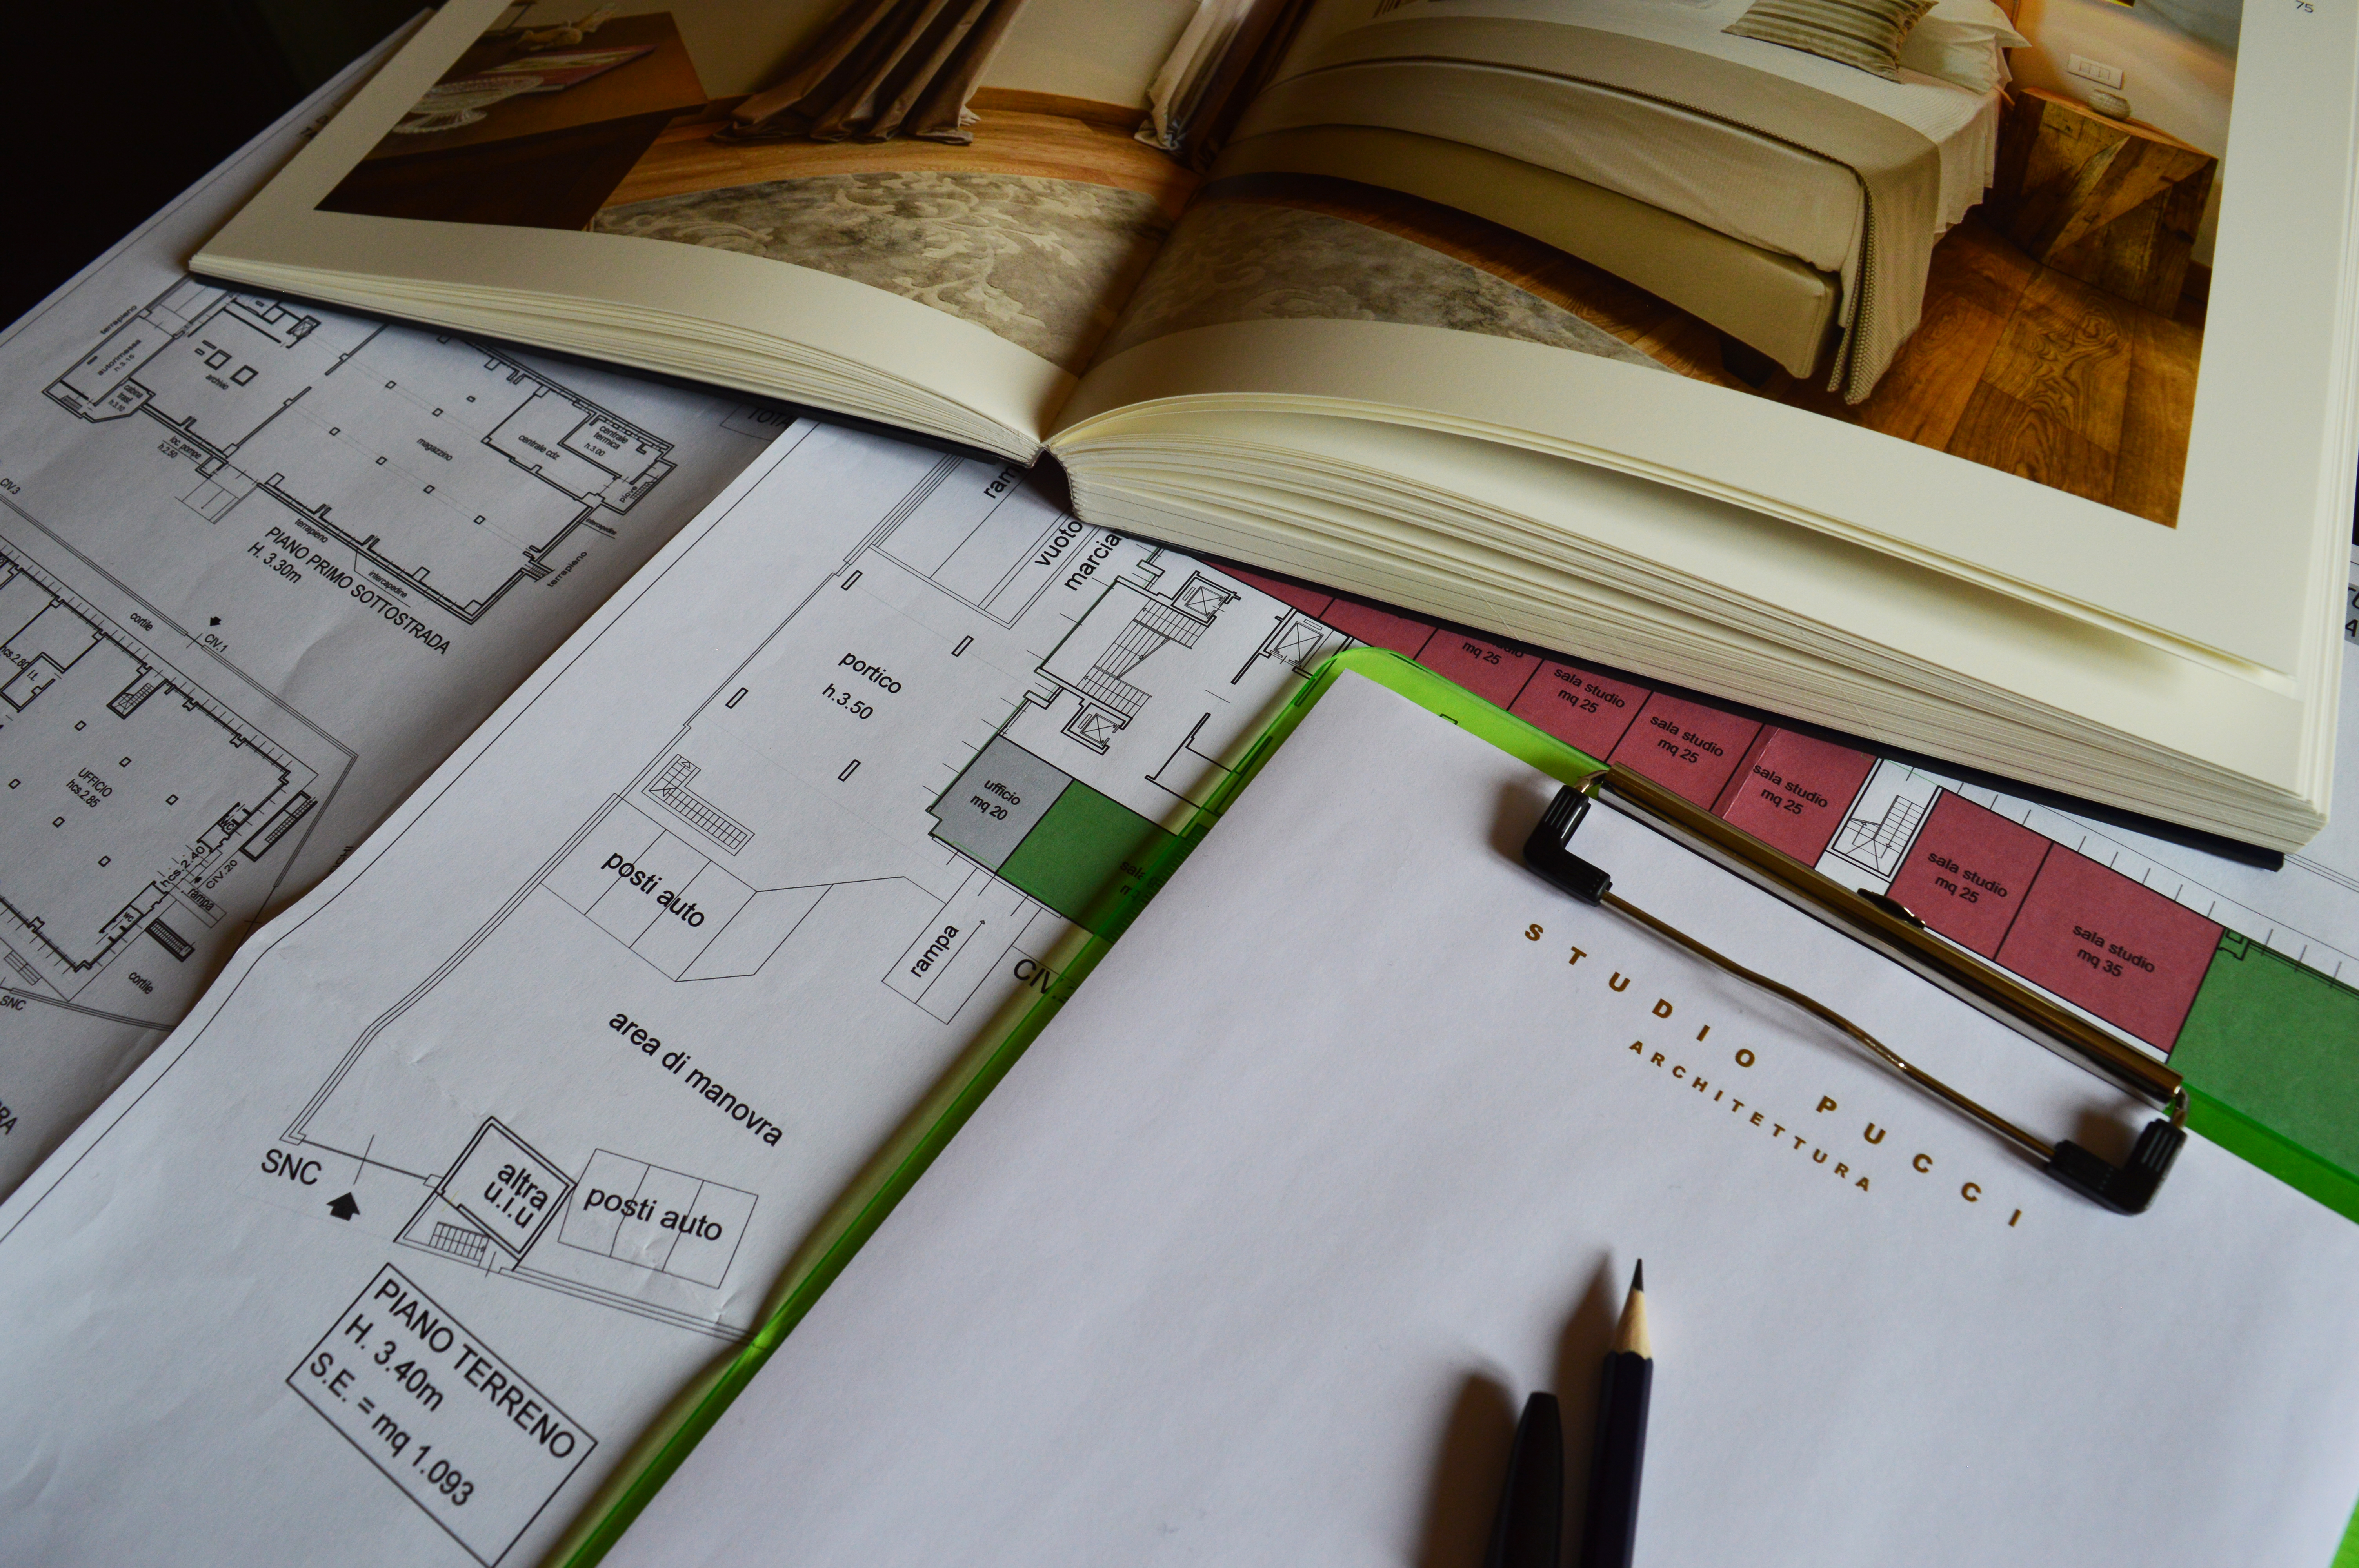 studio architettura pucci firenze